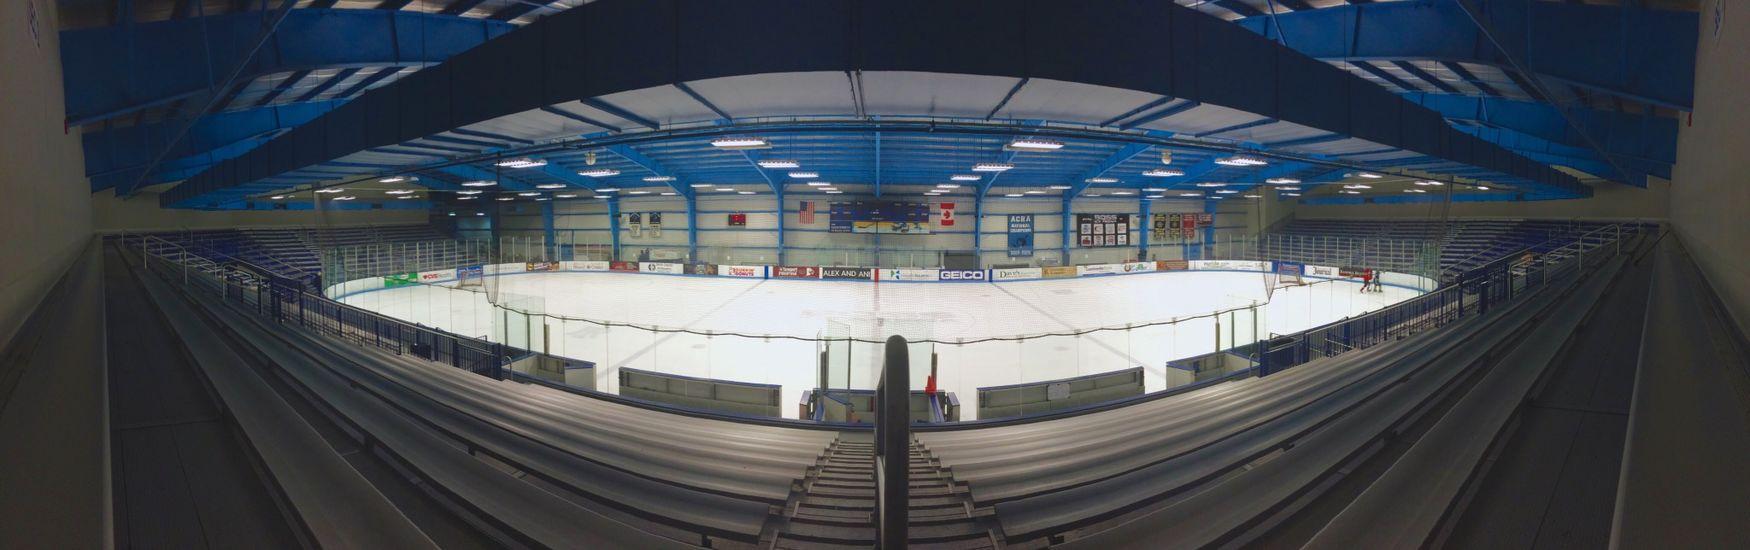 my home away from home Hockey Icerink Uri